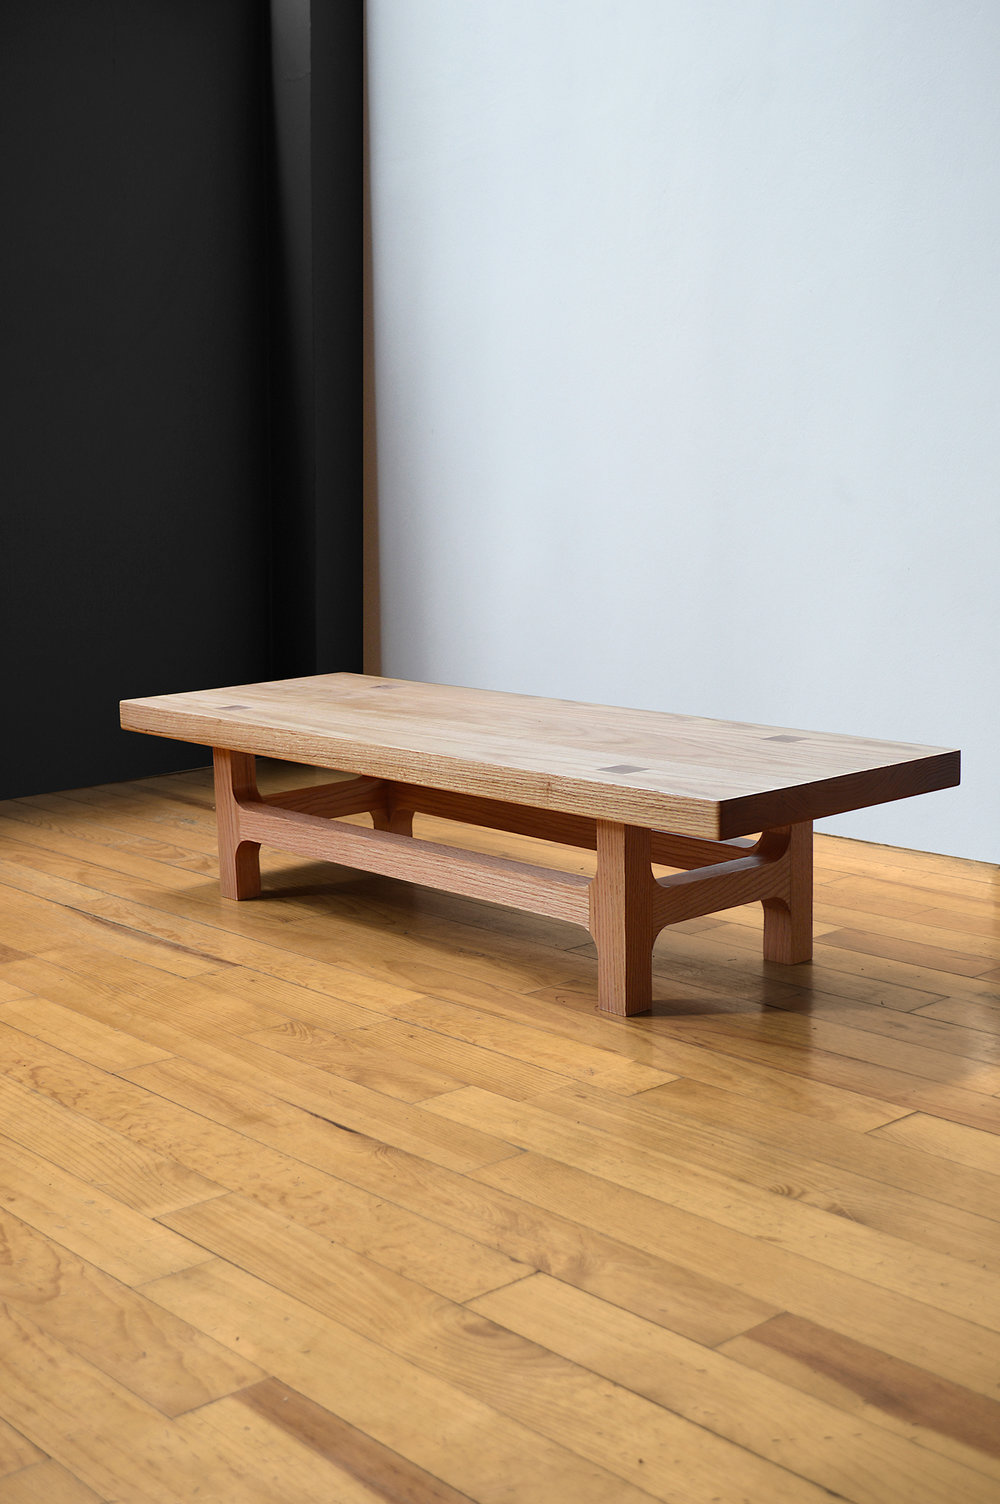 acoocooro-bench-130.jpg